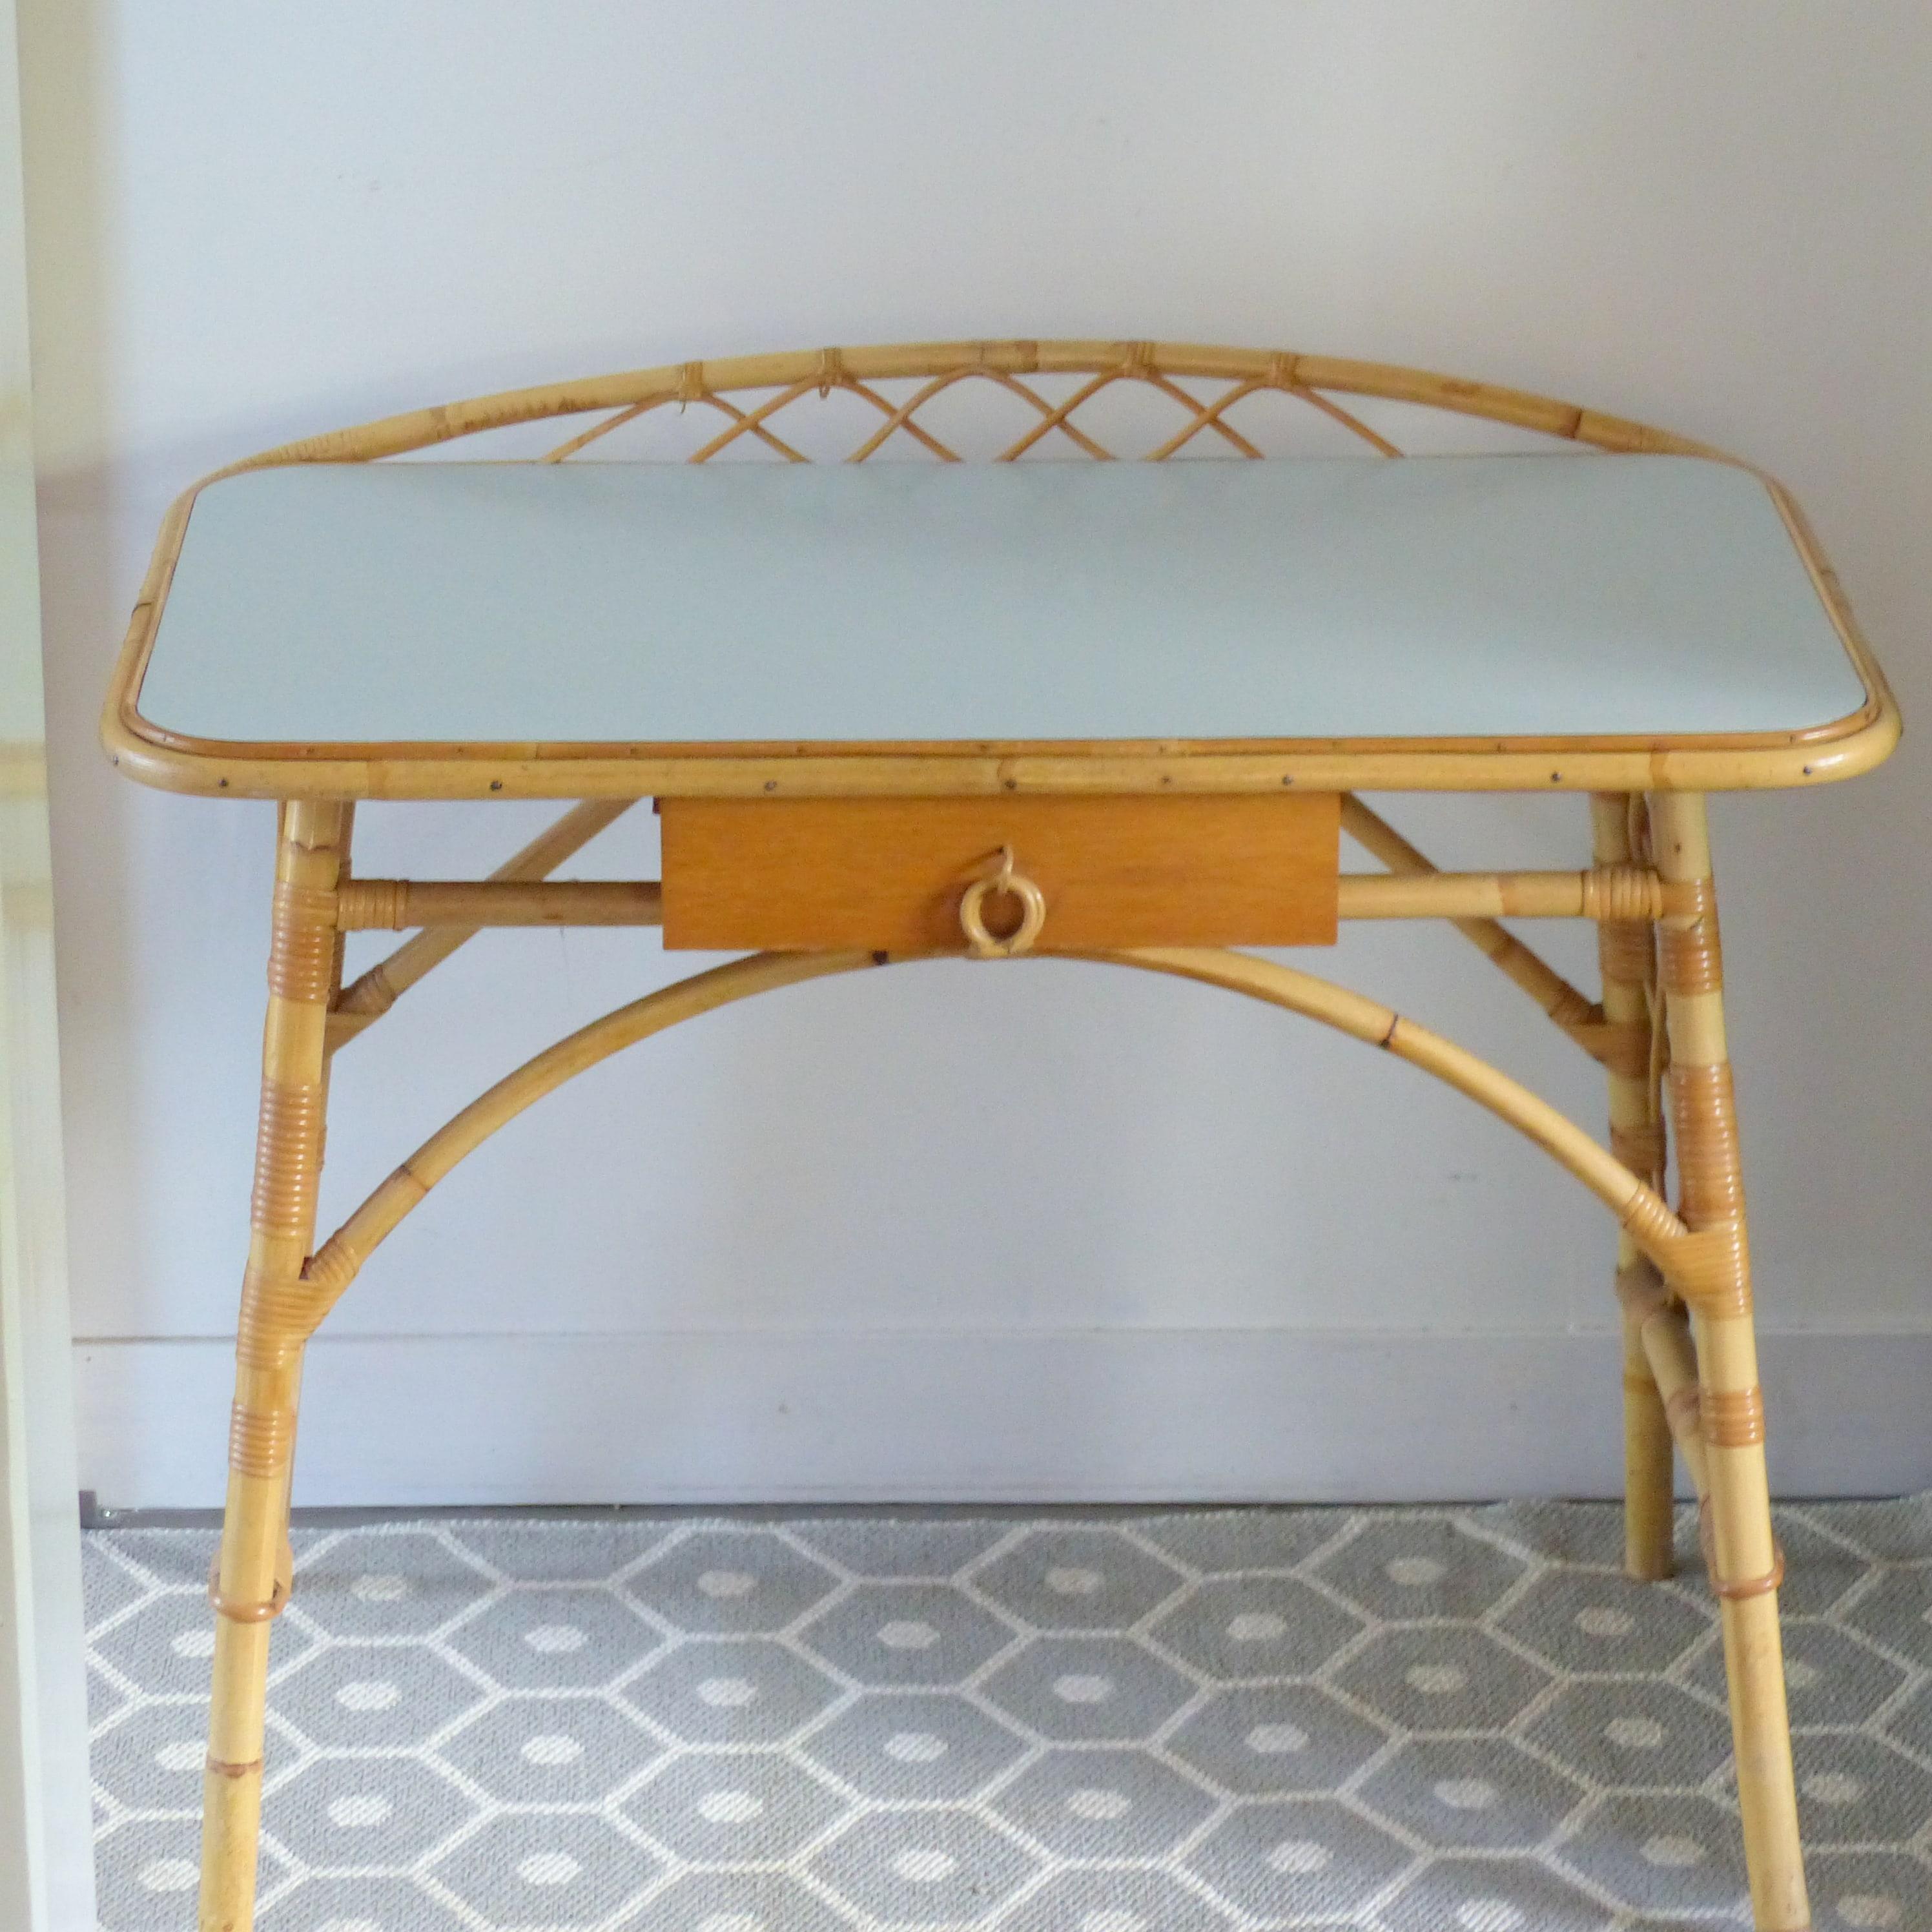 bureau et tabouret en rotin louis sognot lignedebrocante brocante en ligne chine pour vous. Black Bedroom Furniture Sets. Home Design Ideas